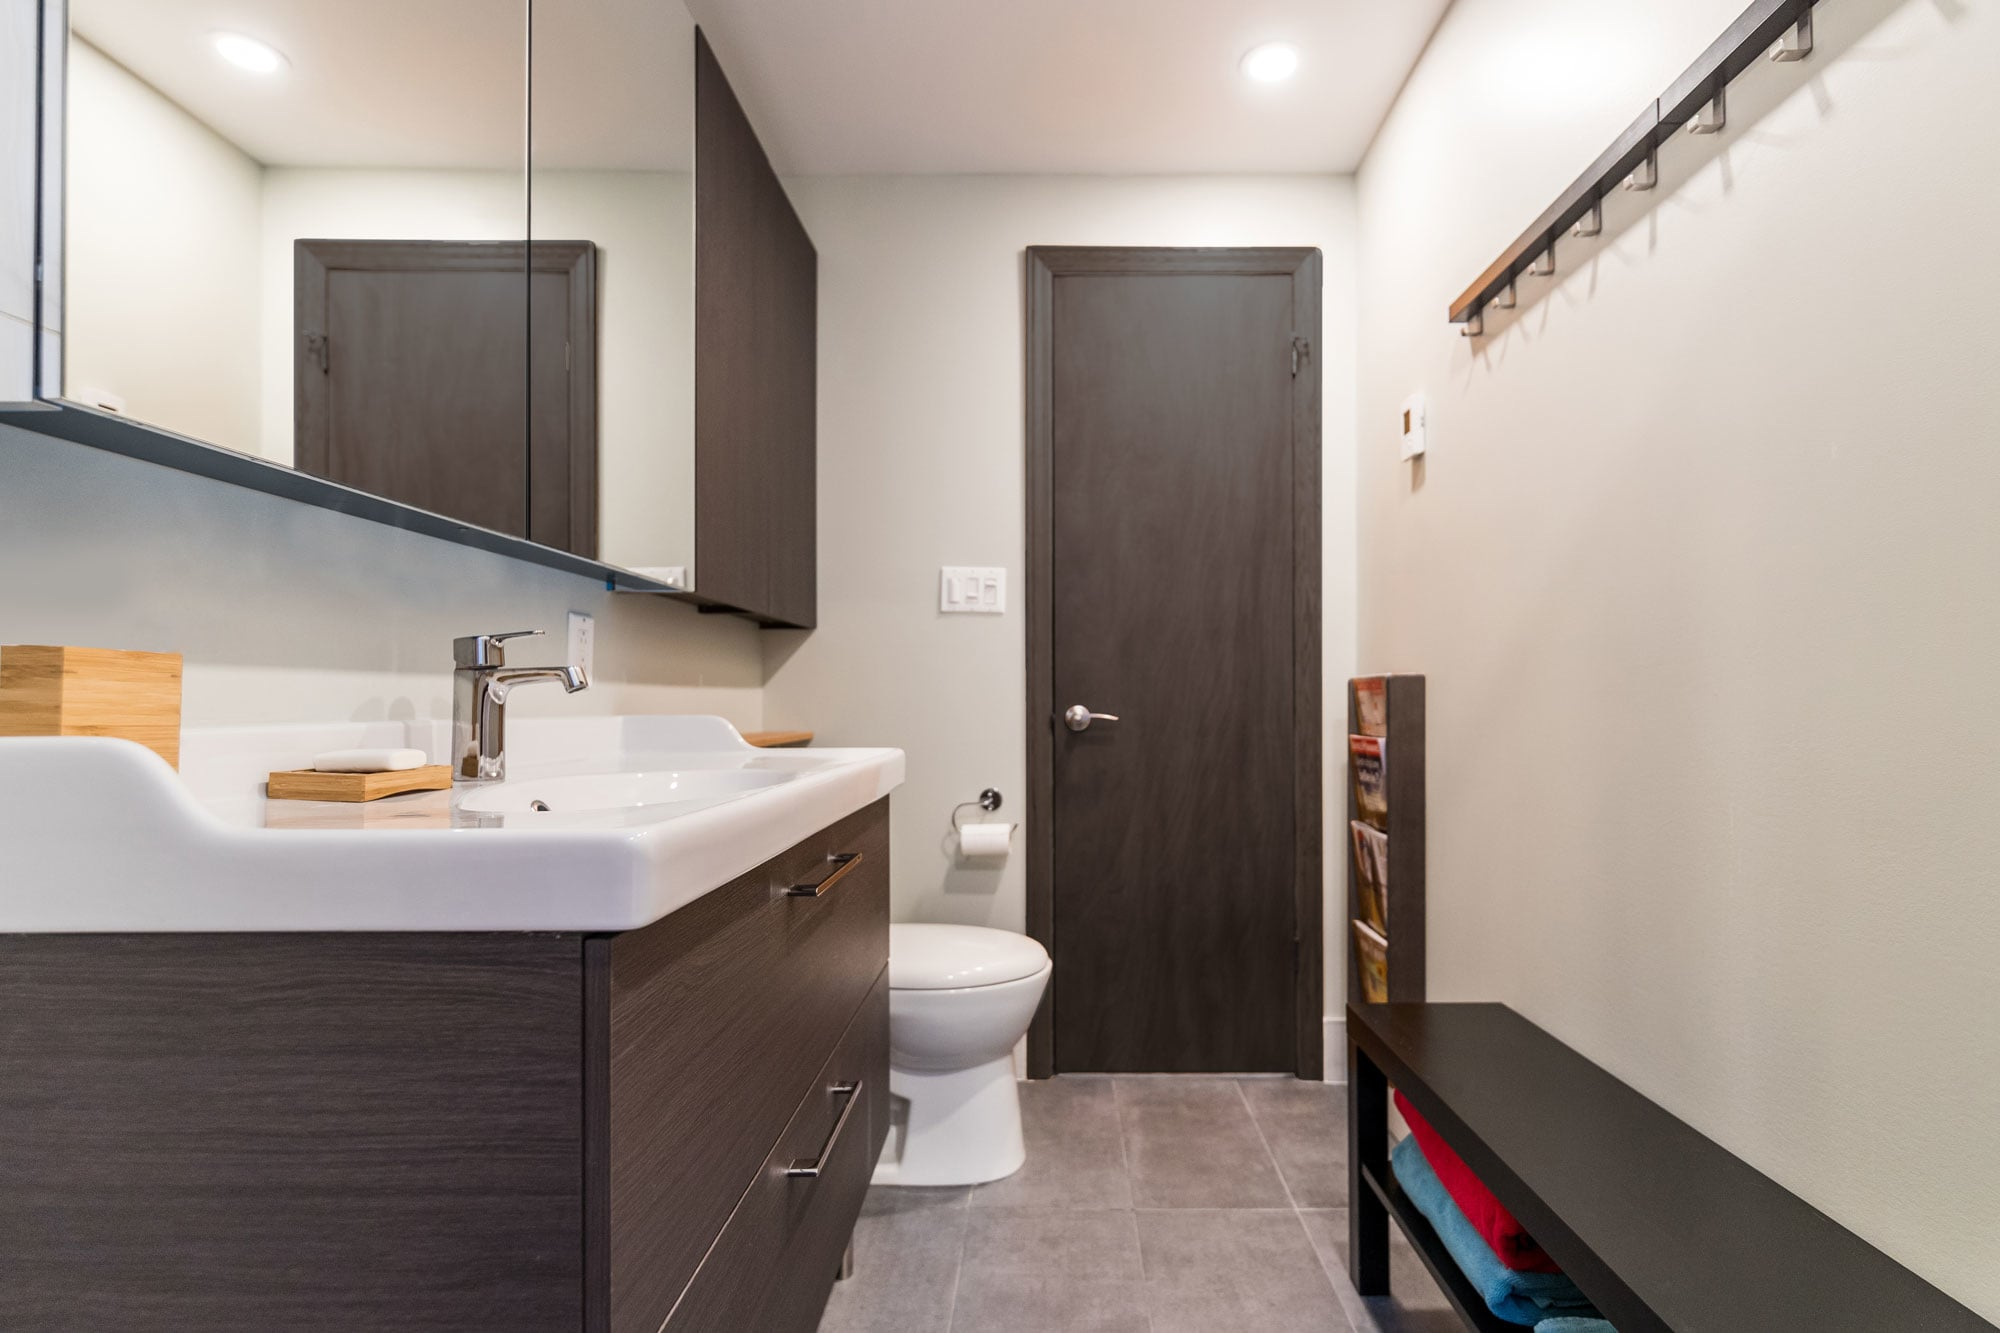 design d'une petite salle de bain moderne